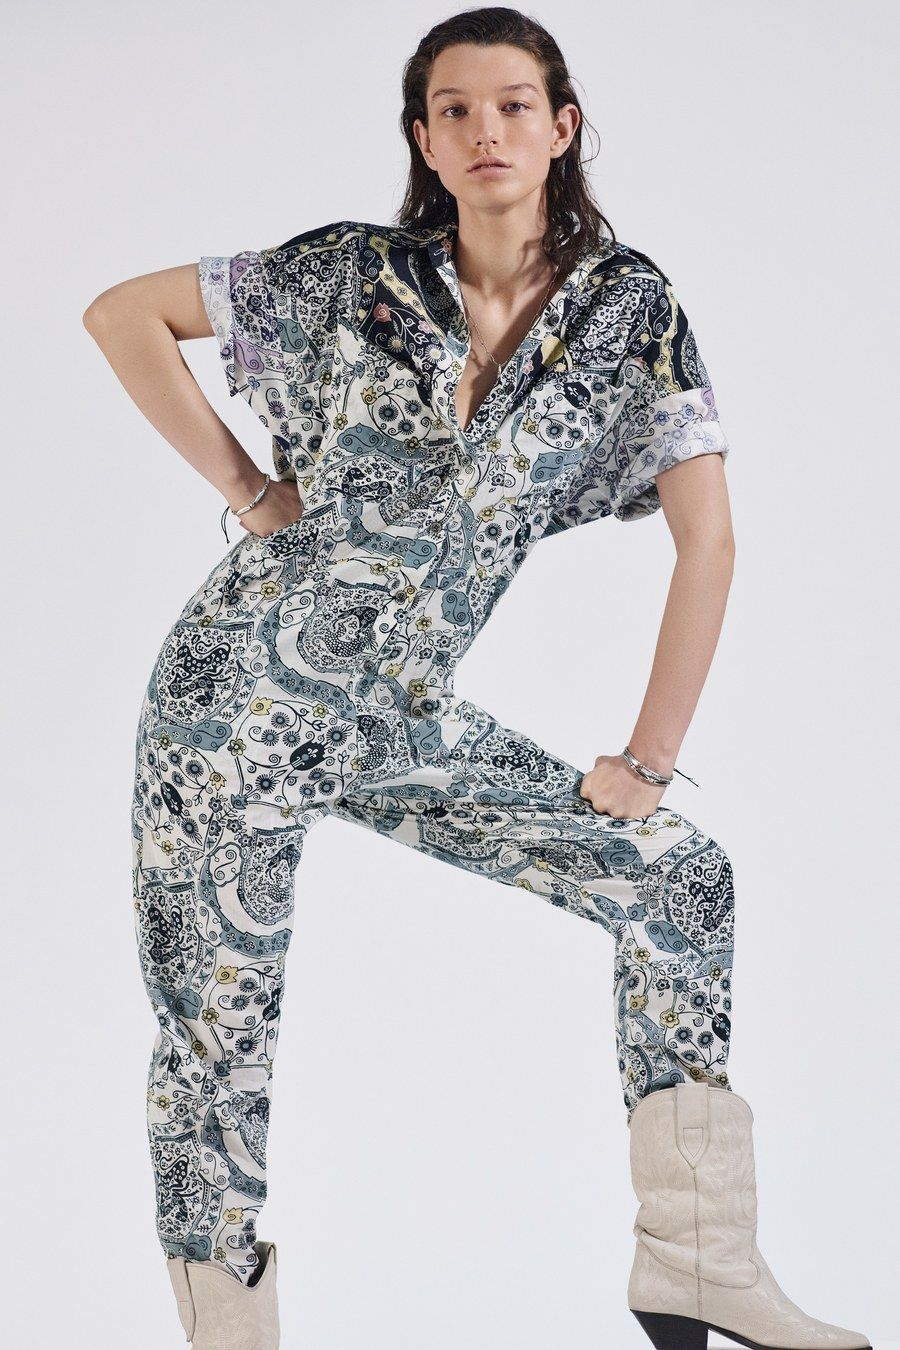 Étoile Isabel Marant Spring 2020 ReadytoWear Fashion